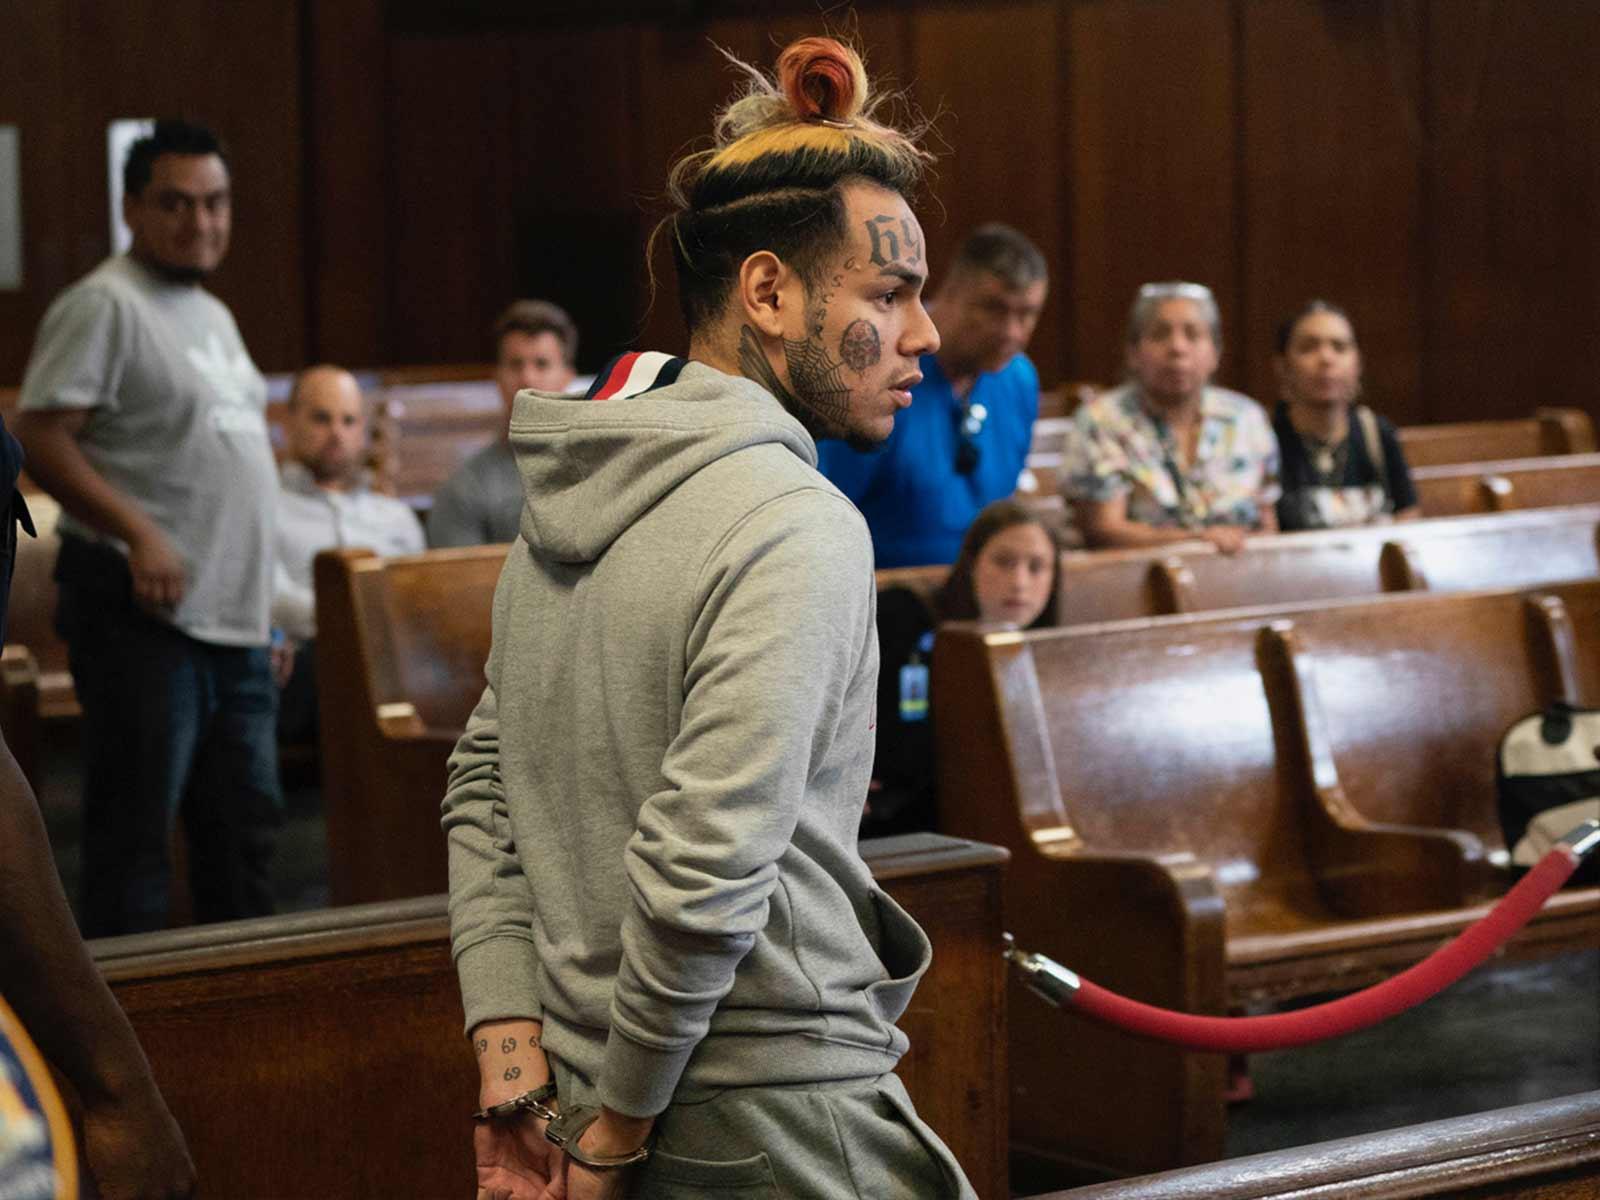 6ix9ine отбывал срок в тюрьме